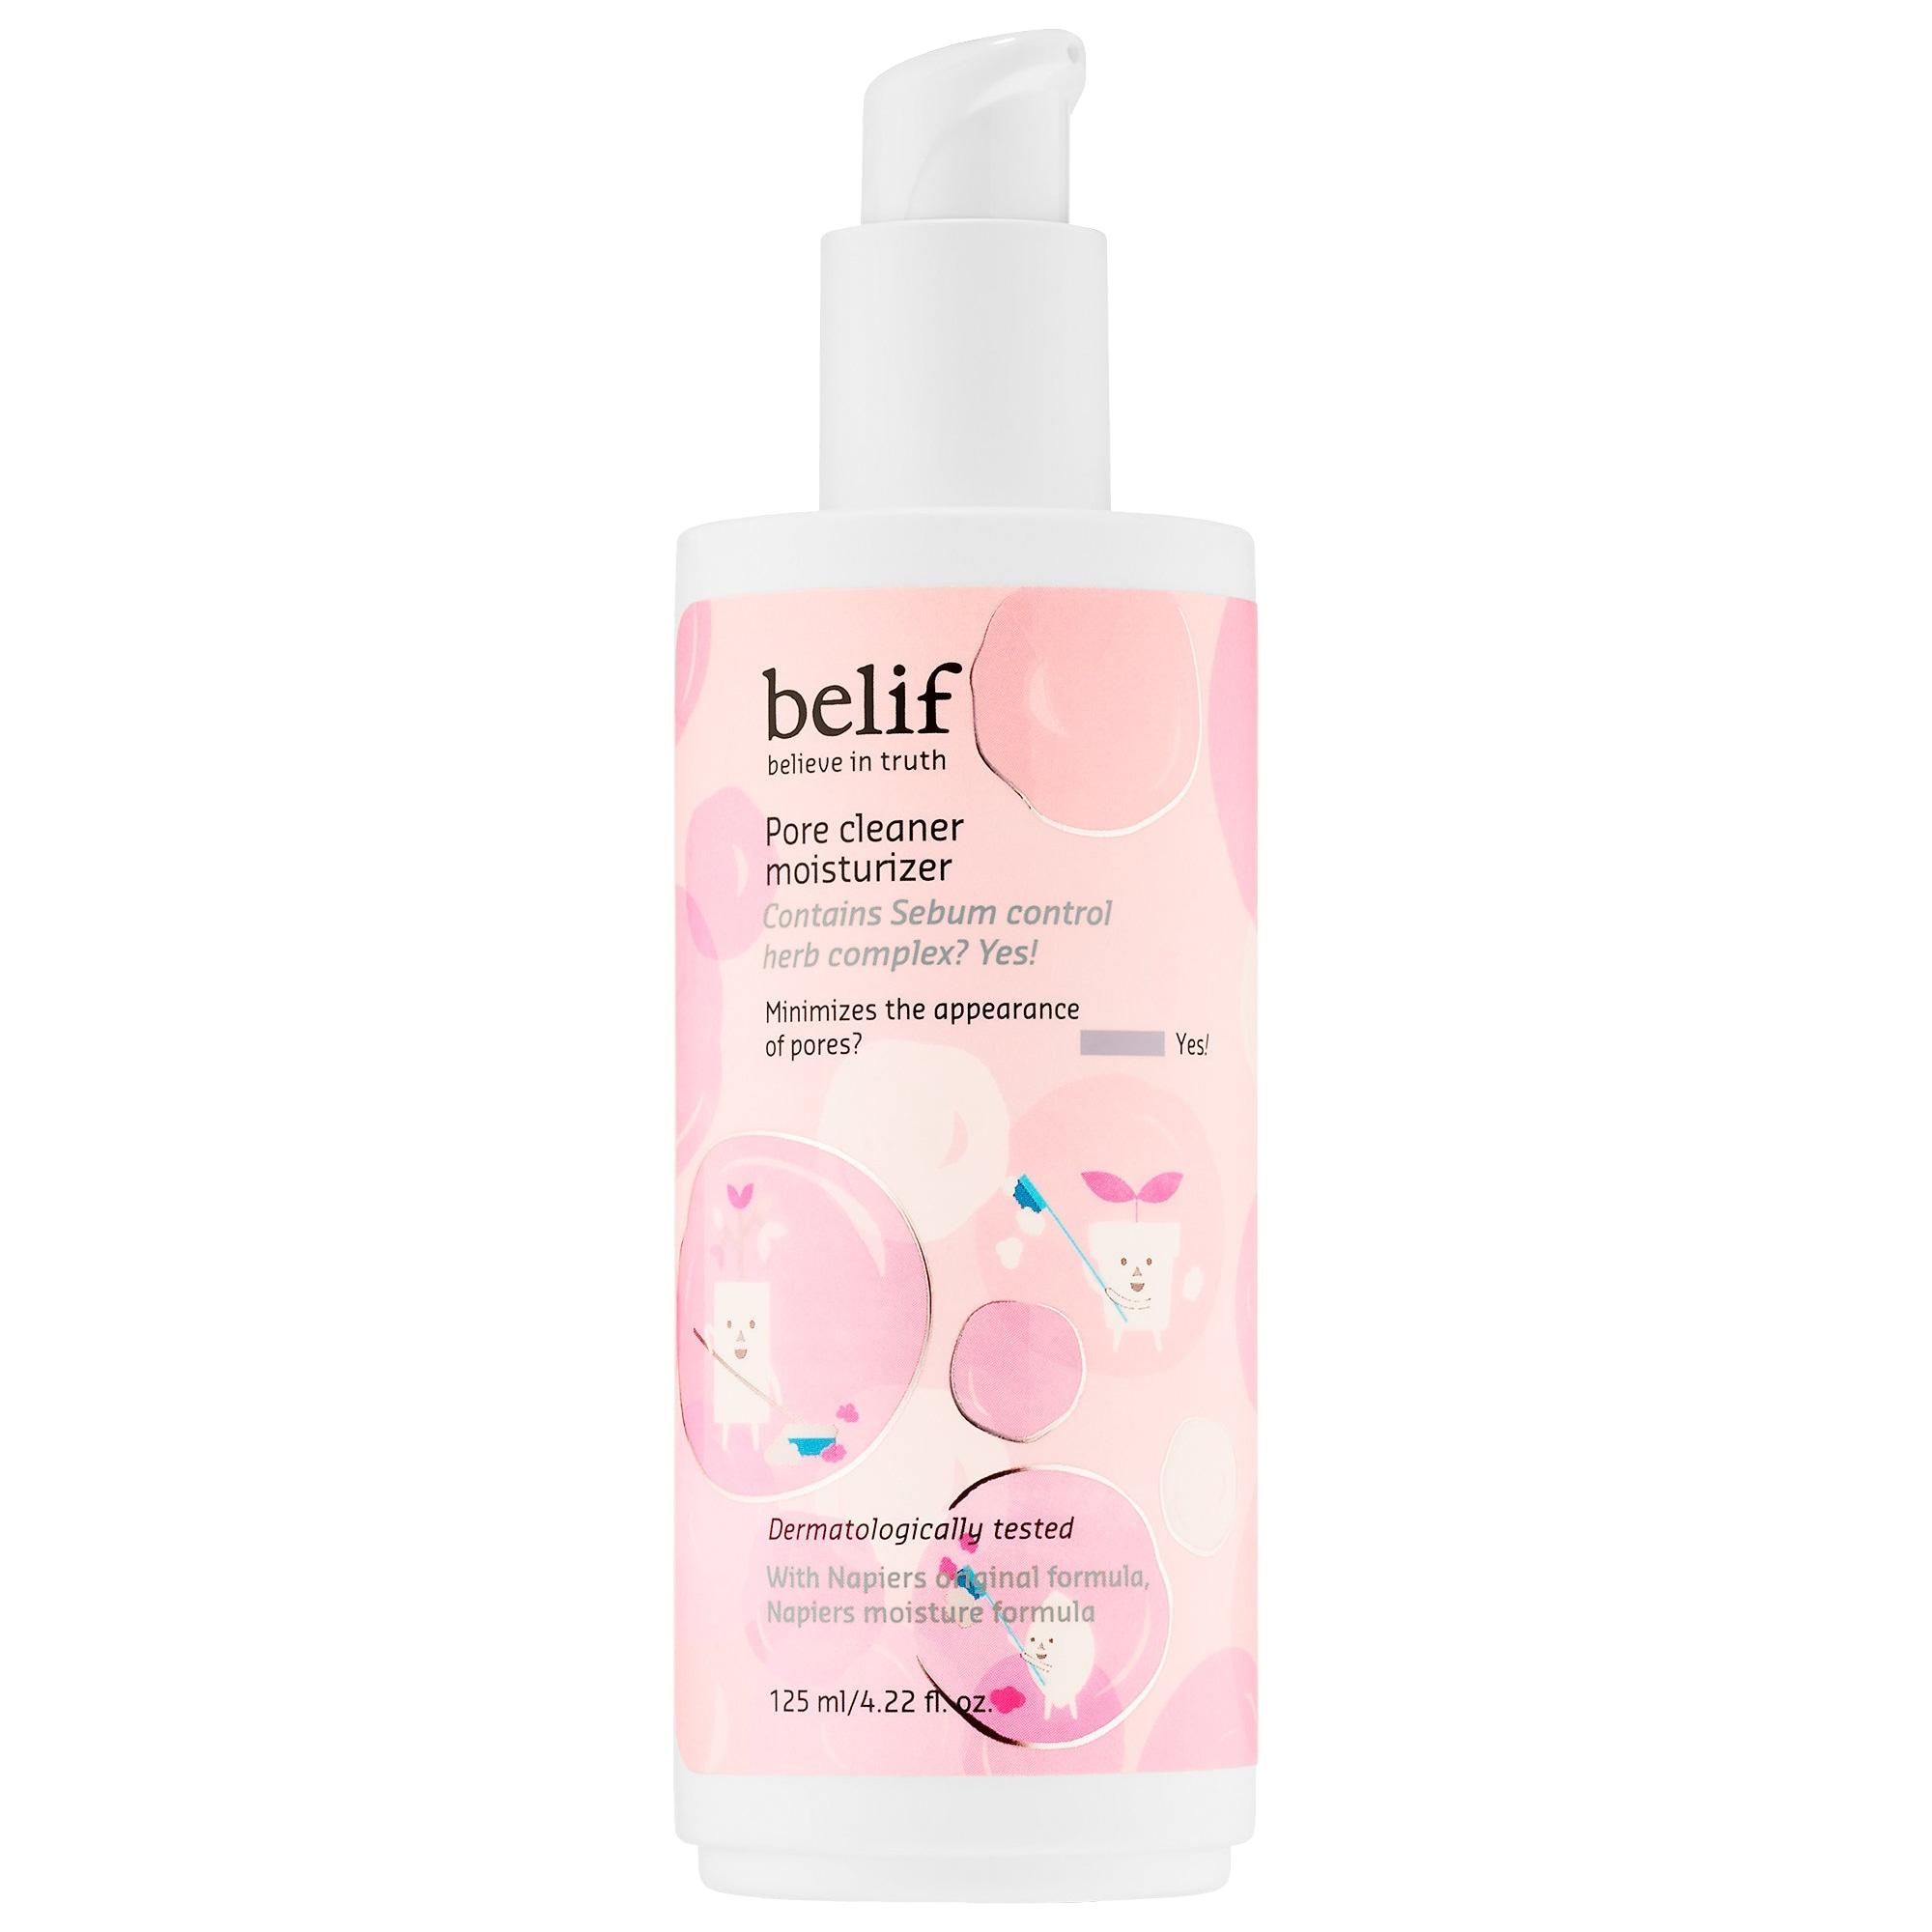 Belif - Pore Cleaner Moisturizer